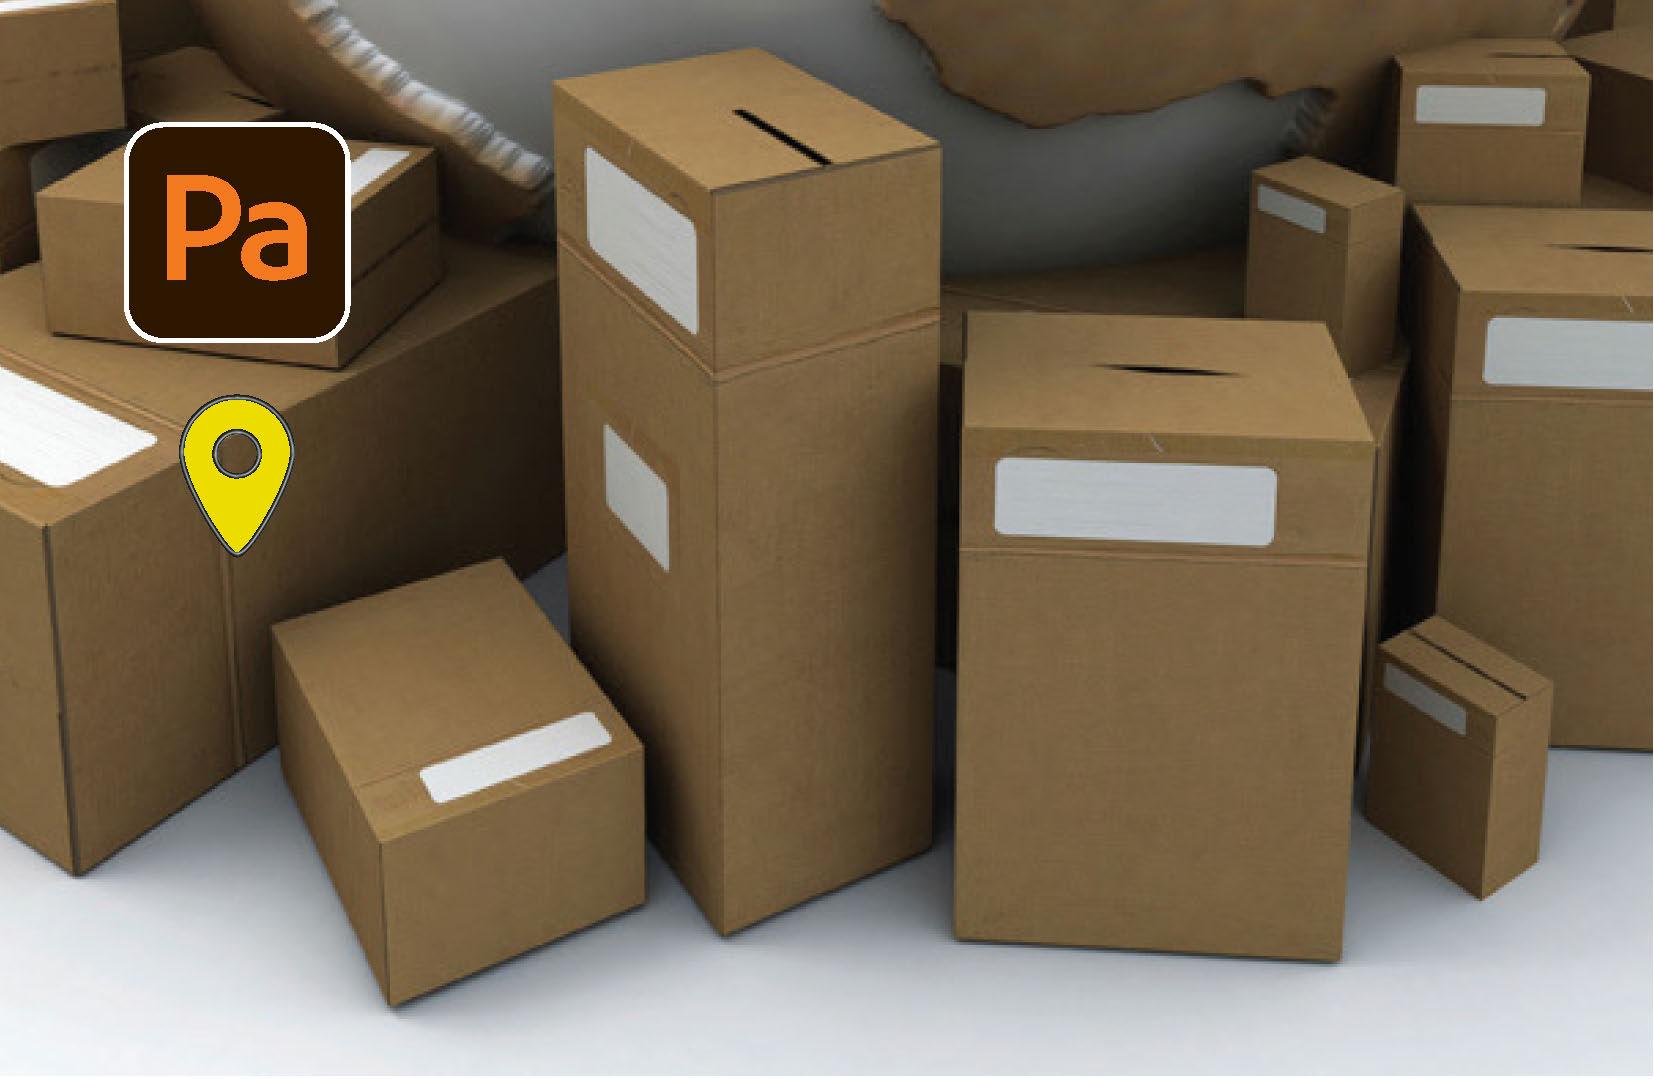 Packaging Design Fundamentals